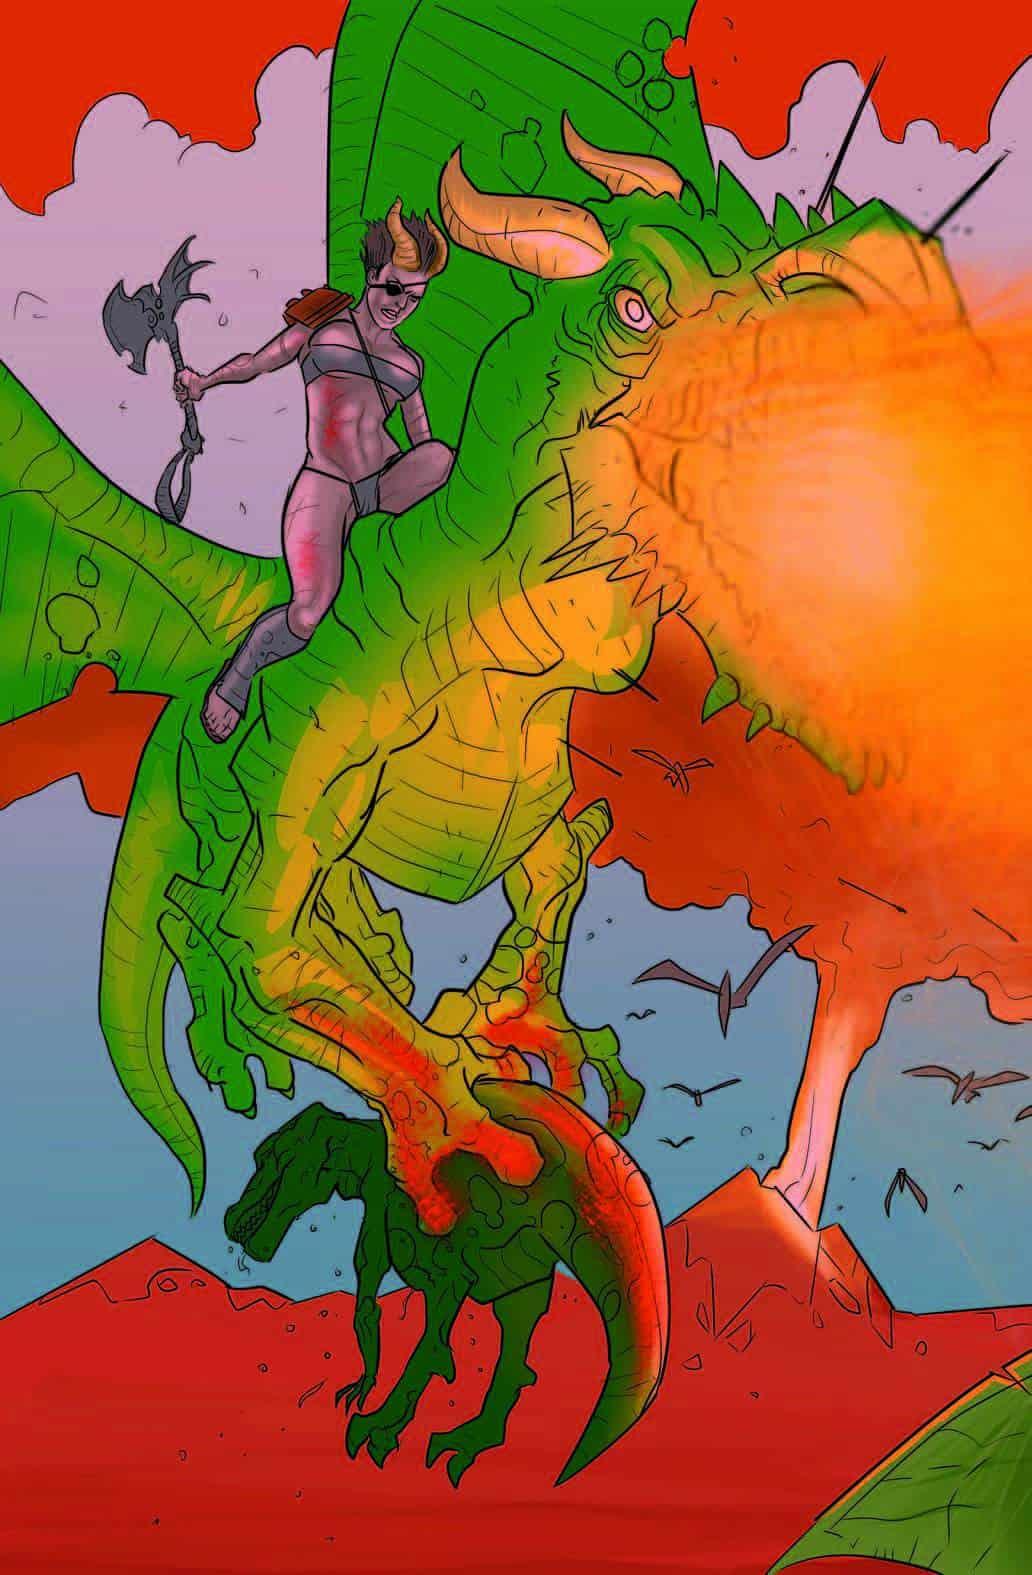 Dragons-vs-Dinosaurs-image-02